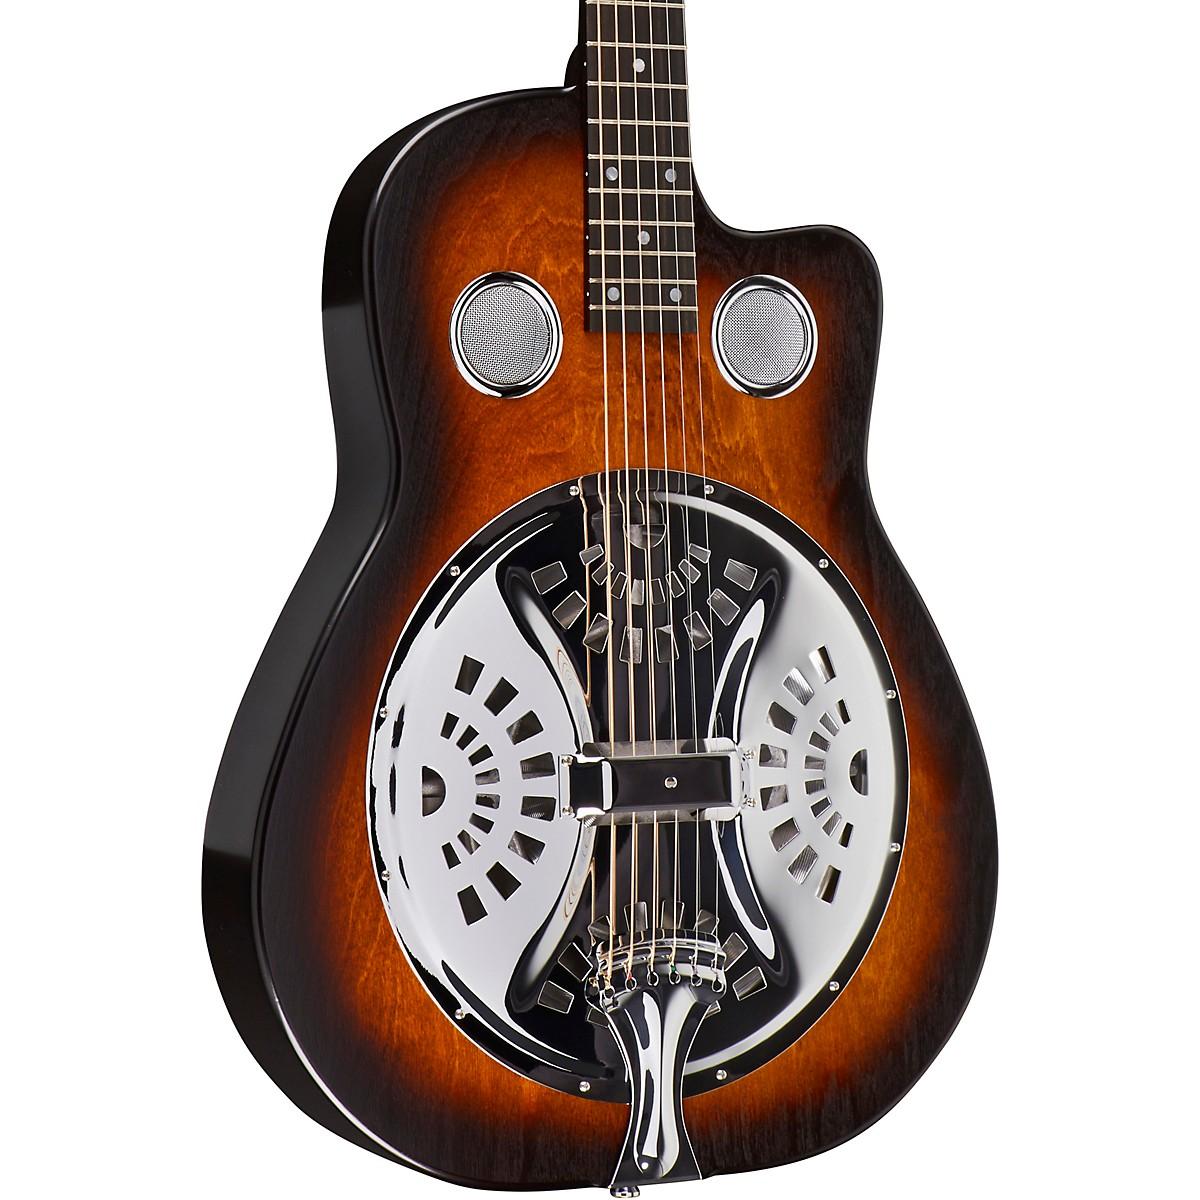 Beard Guitars Copper Mountain Roundneck Single Pickup Acoustic-Electric Resonator Guitar